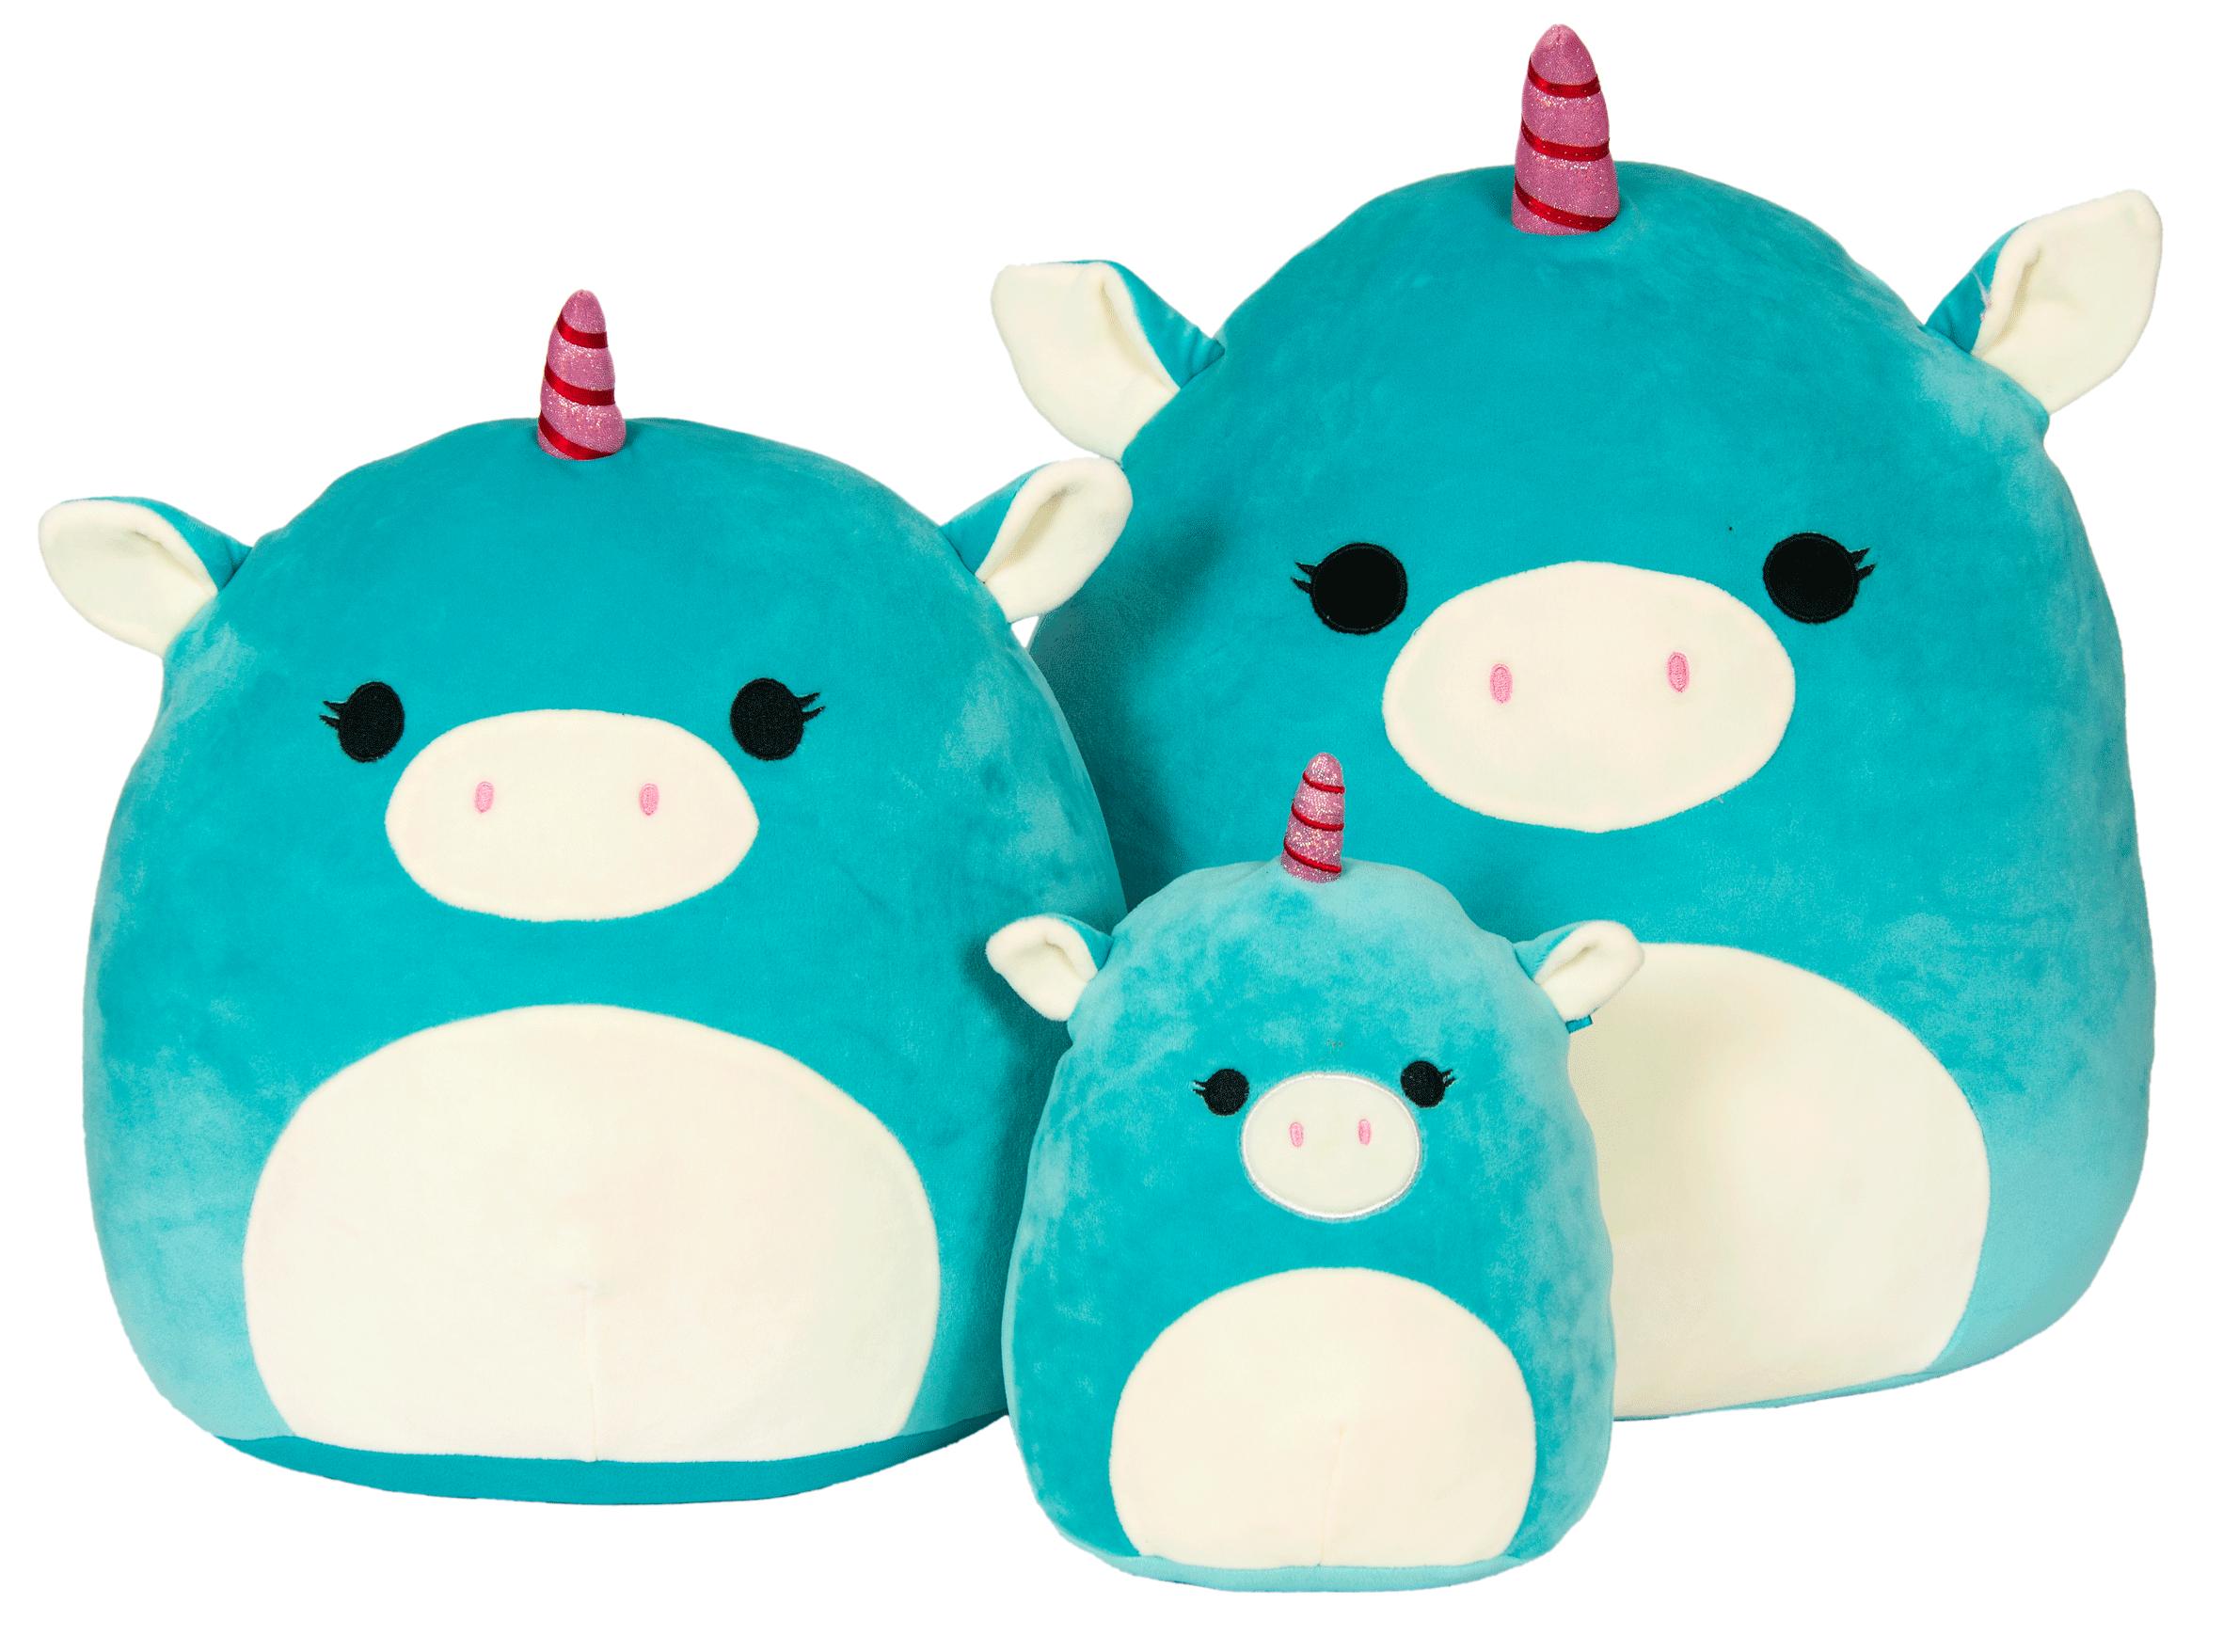 Super Soft Plush Toys Squishmallows Cute Stuffed Animals Cute Plush Best Christmas Toys